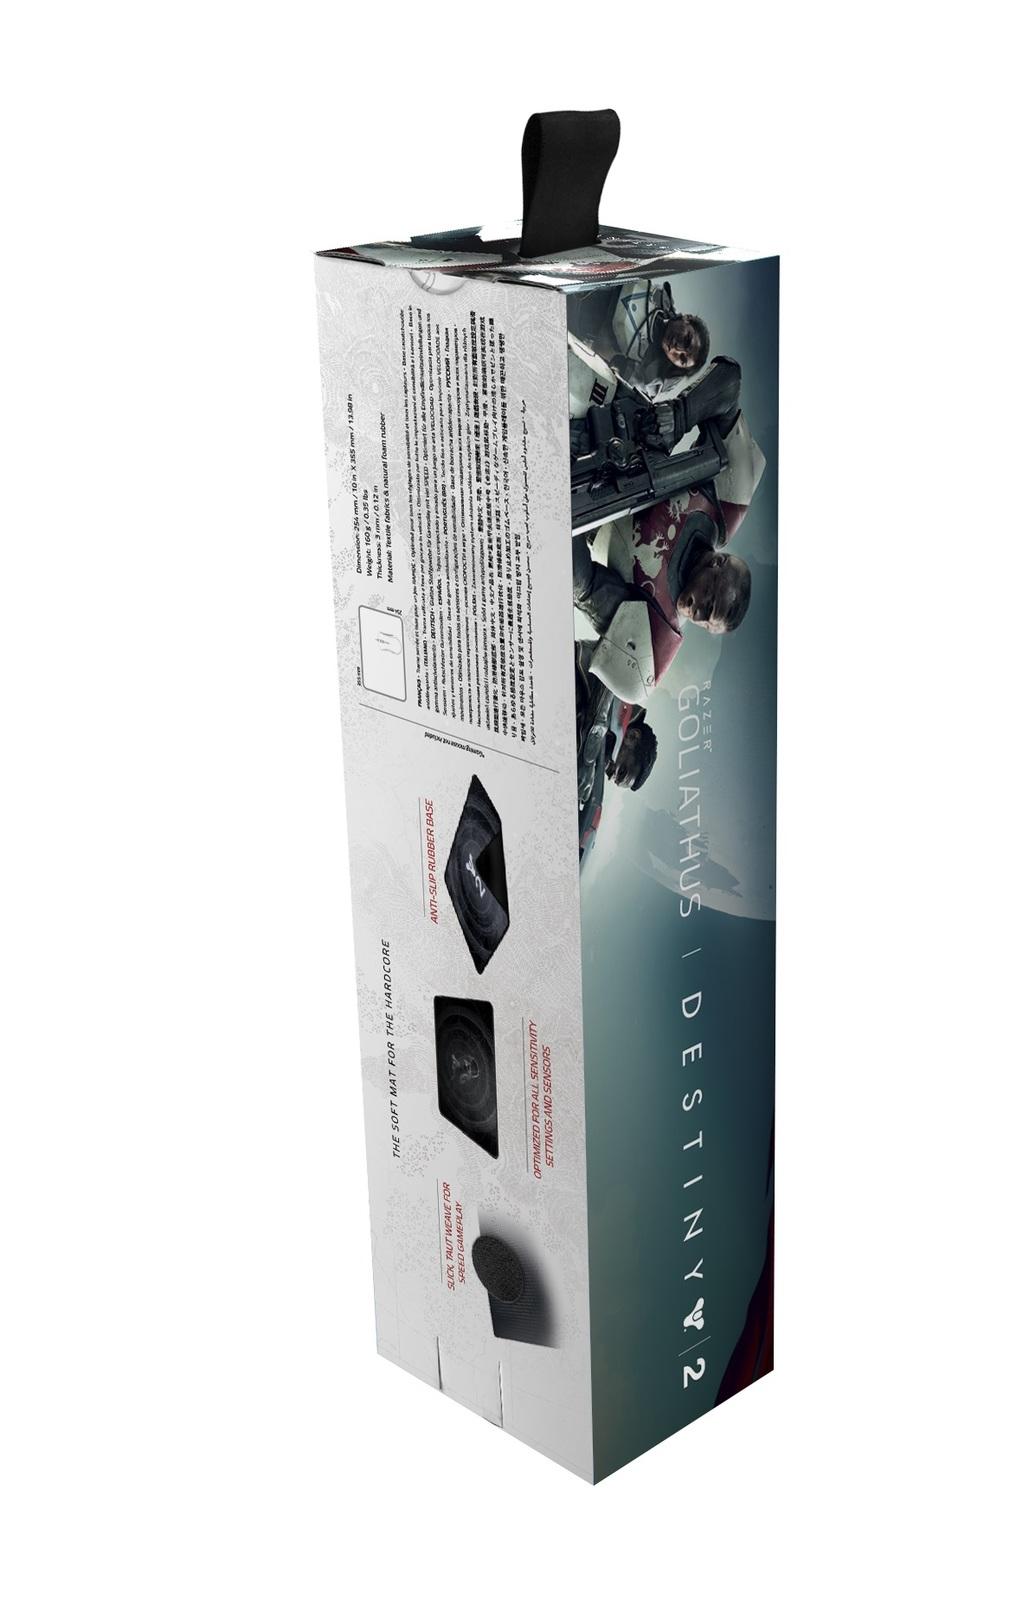 Destiny 2 Razer Goliathus Speed Edition Gaming Mouse Mat (Medium) for PC Games image